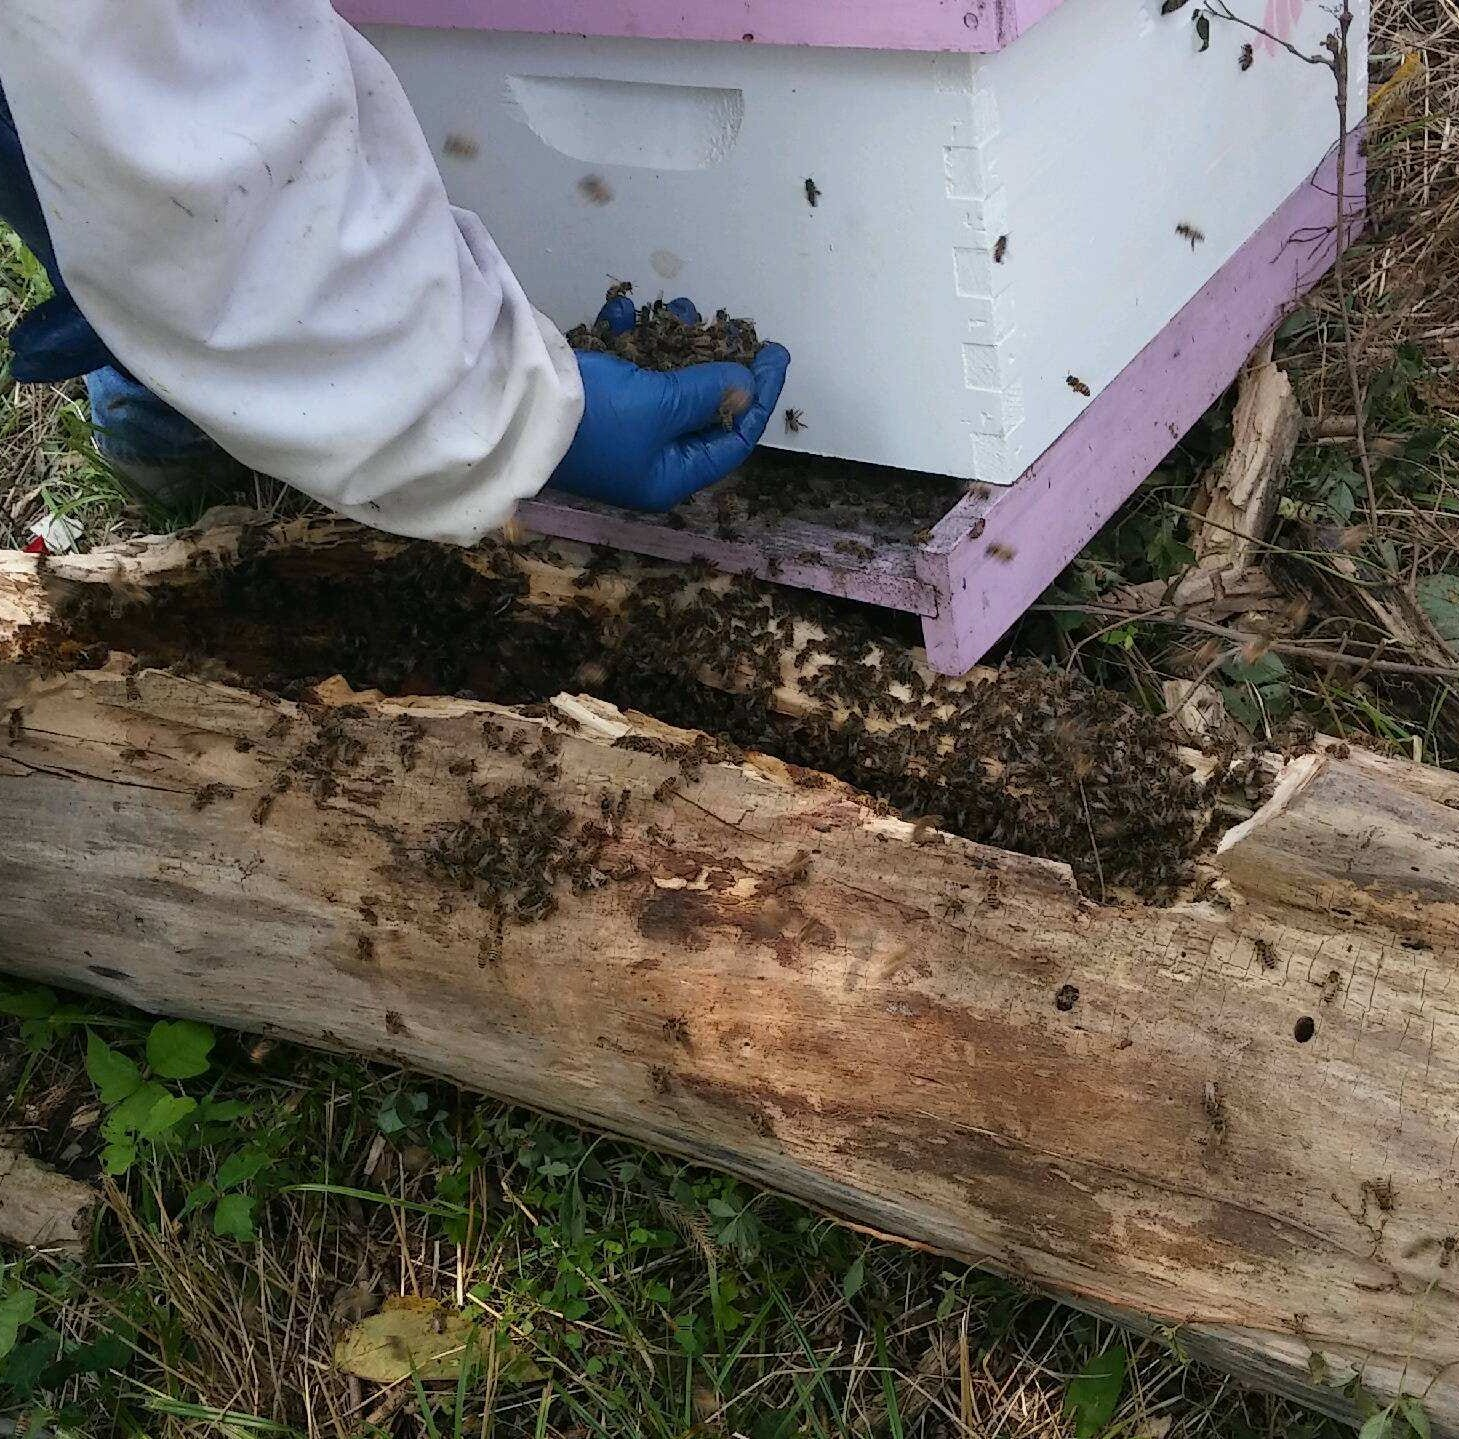 Northern Kentucky beekeeper Pete Montoure rescues...